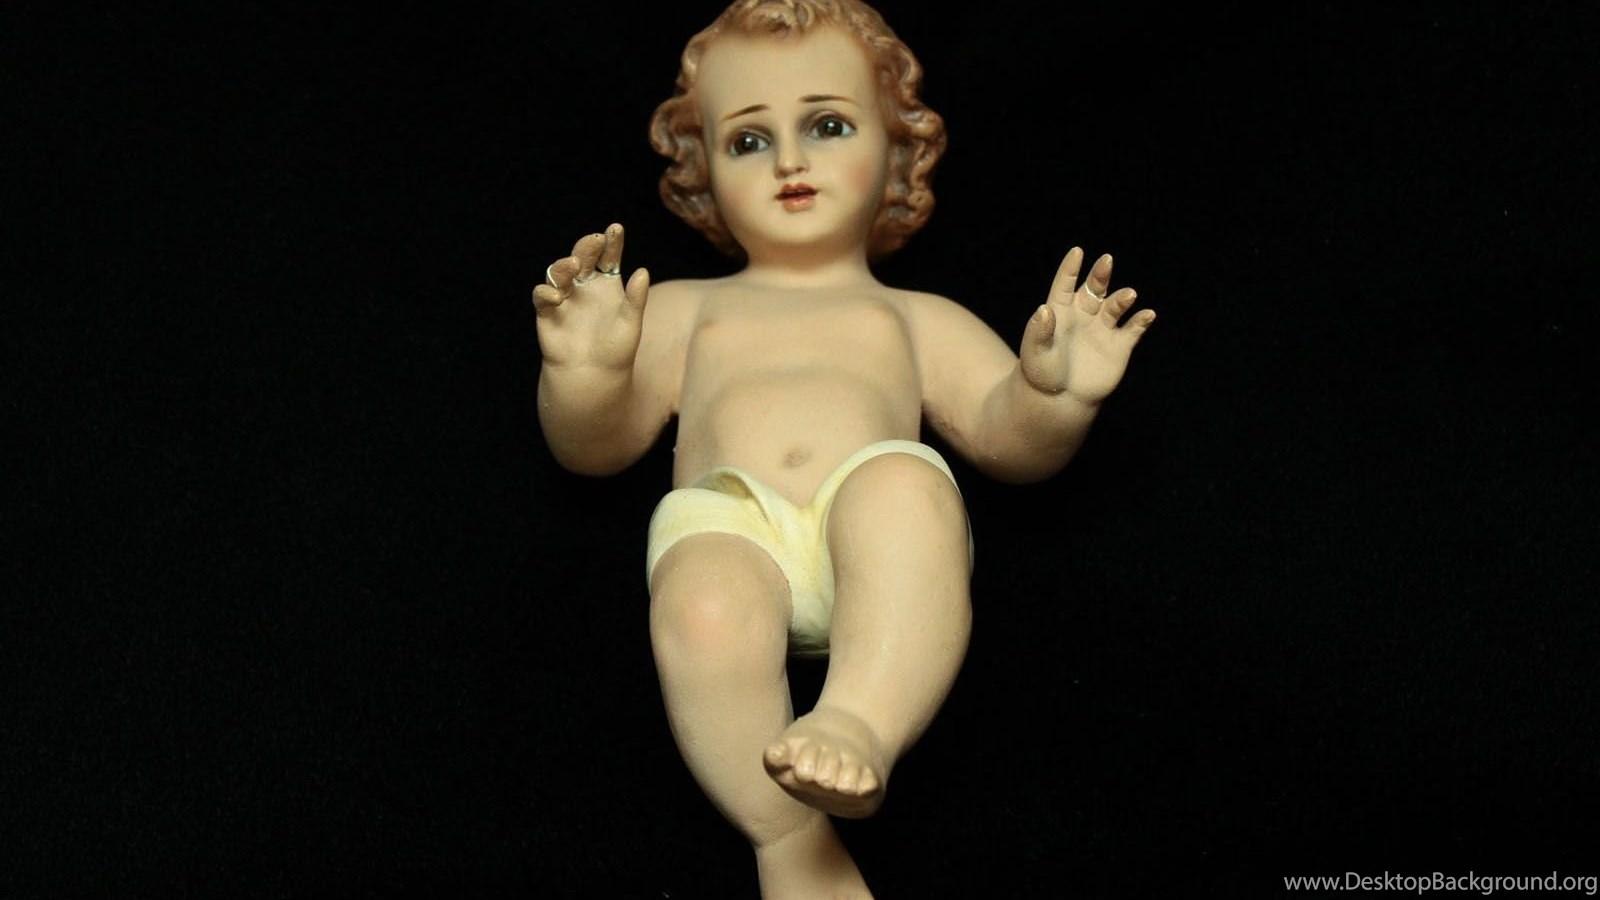 Baby Jesus Hd Wallpaperjpg Desktop Background